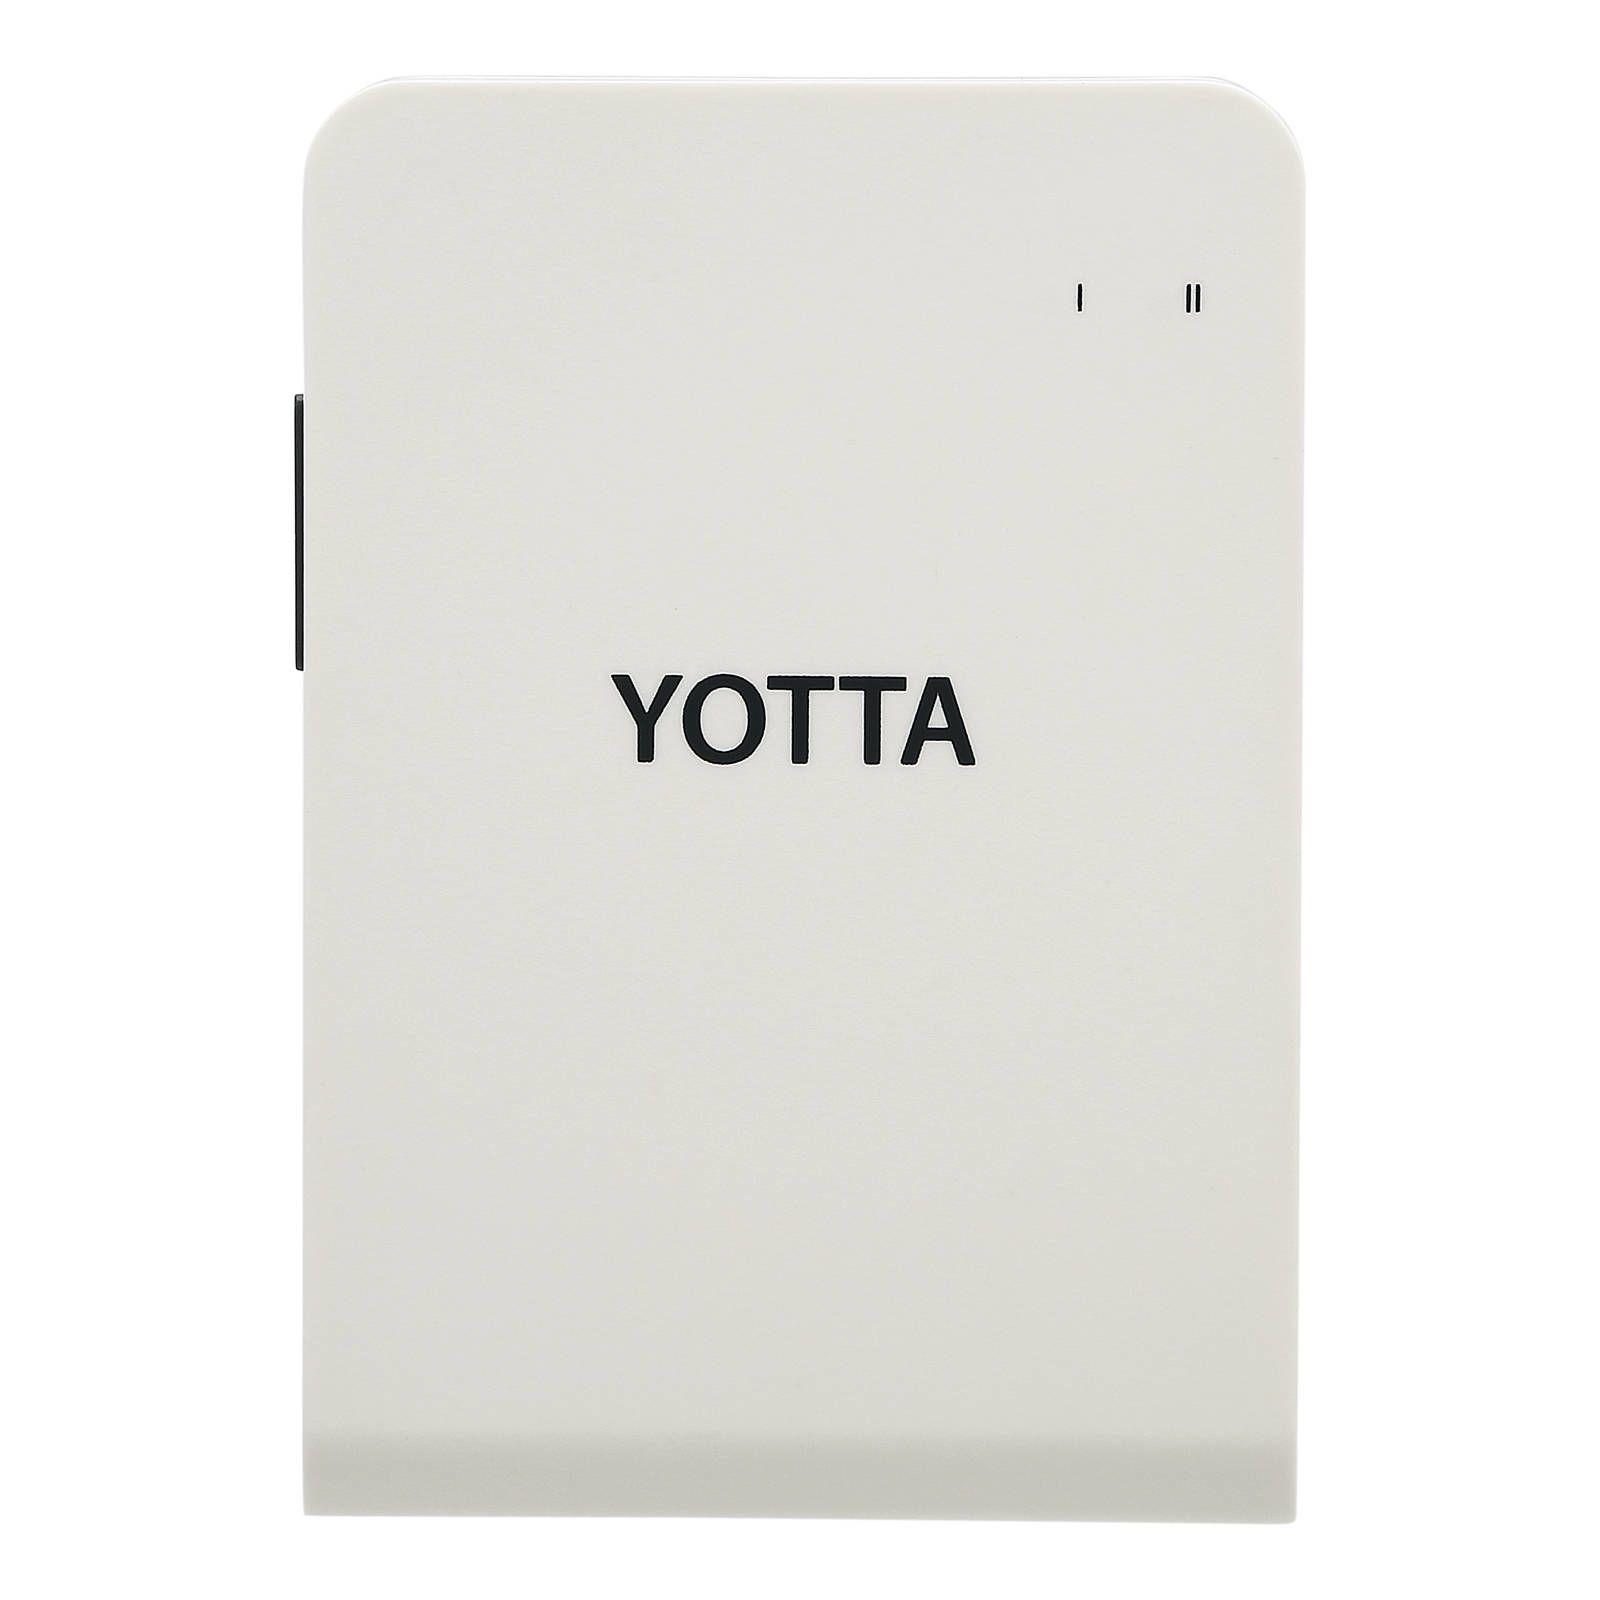 Twinstar Yotta UV-sterilizer